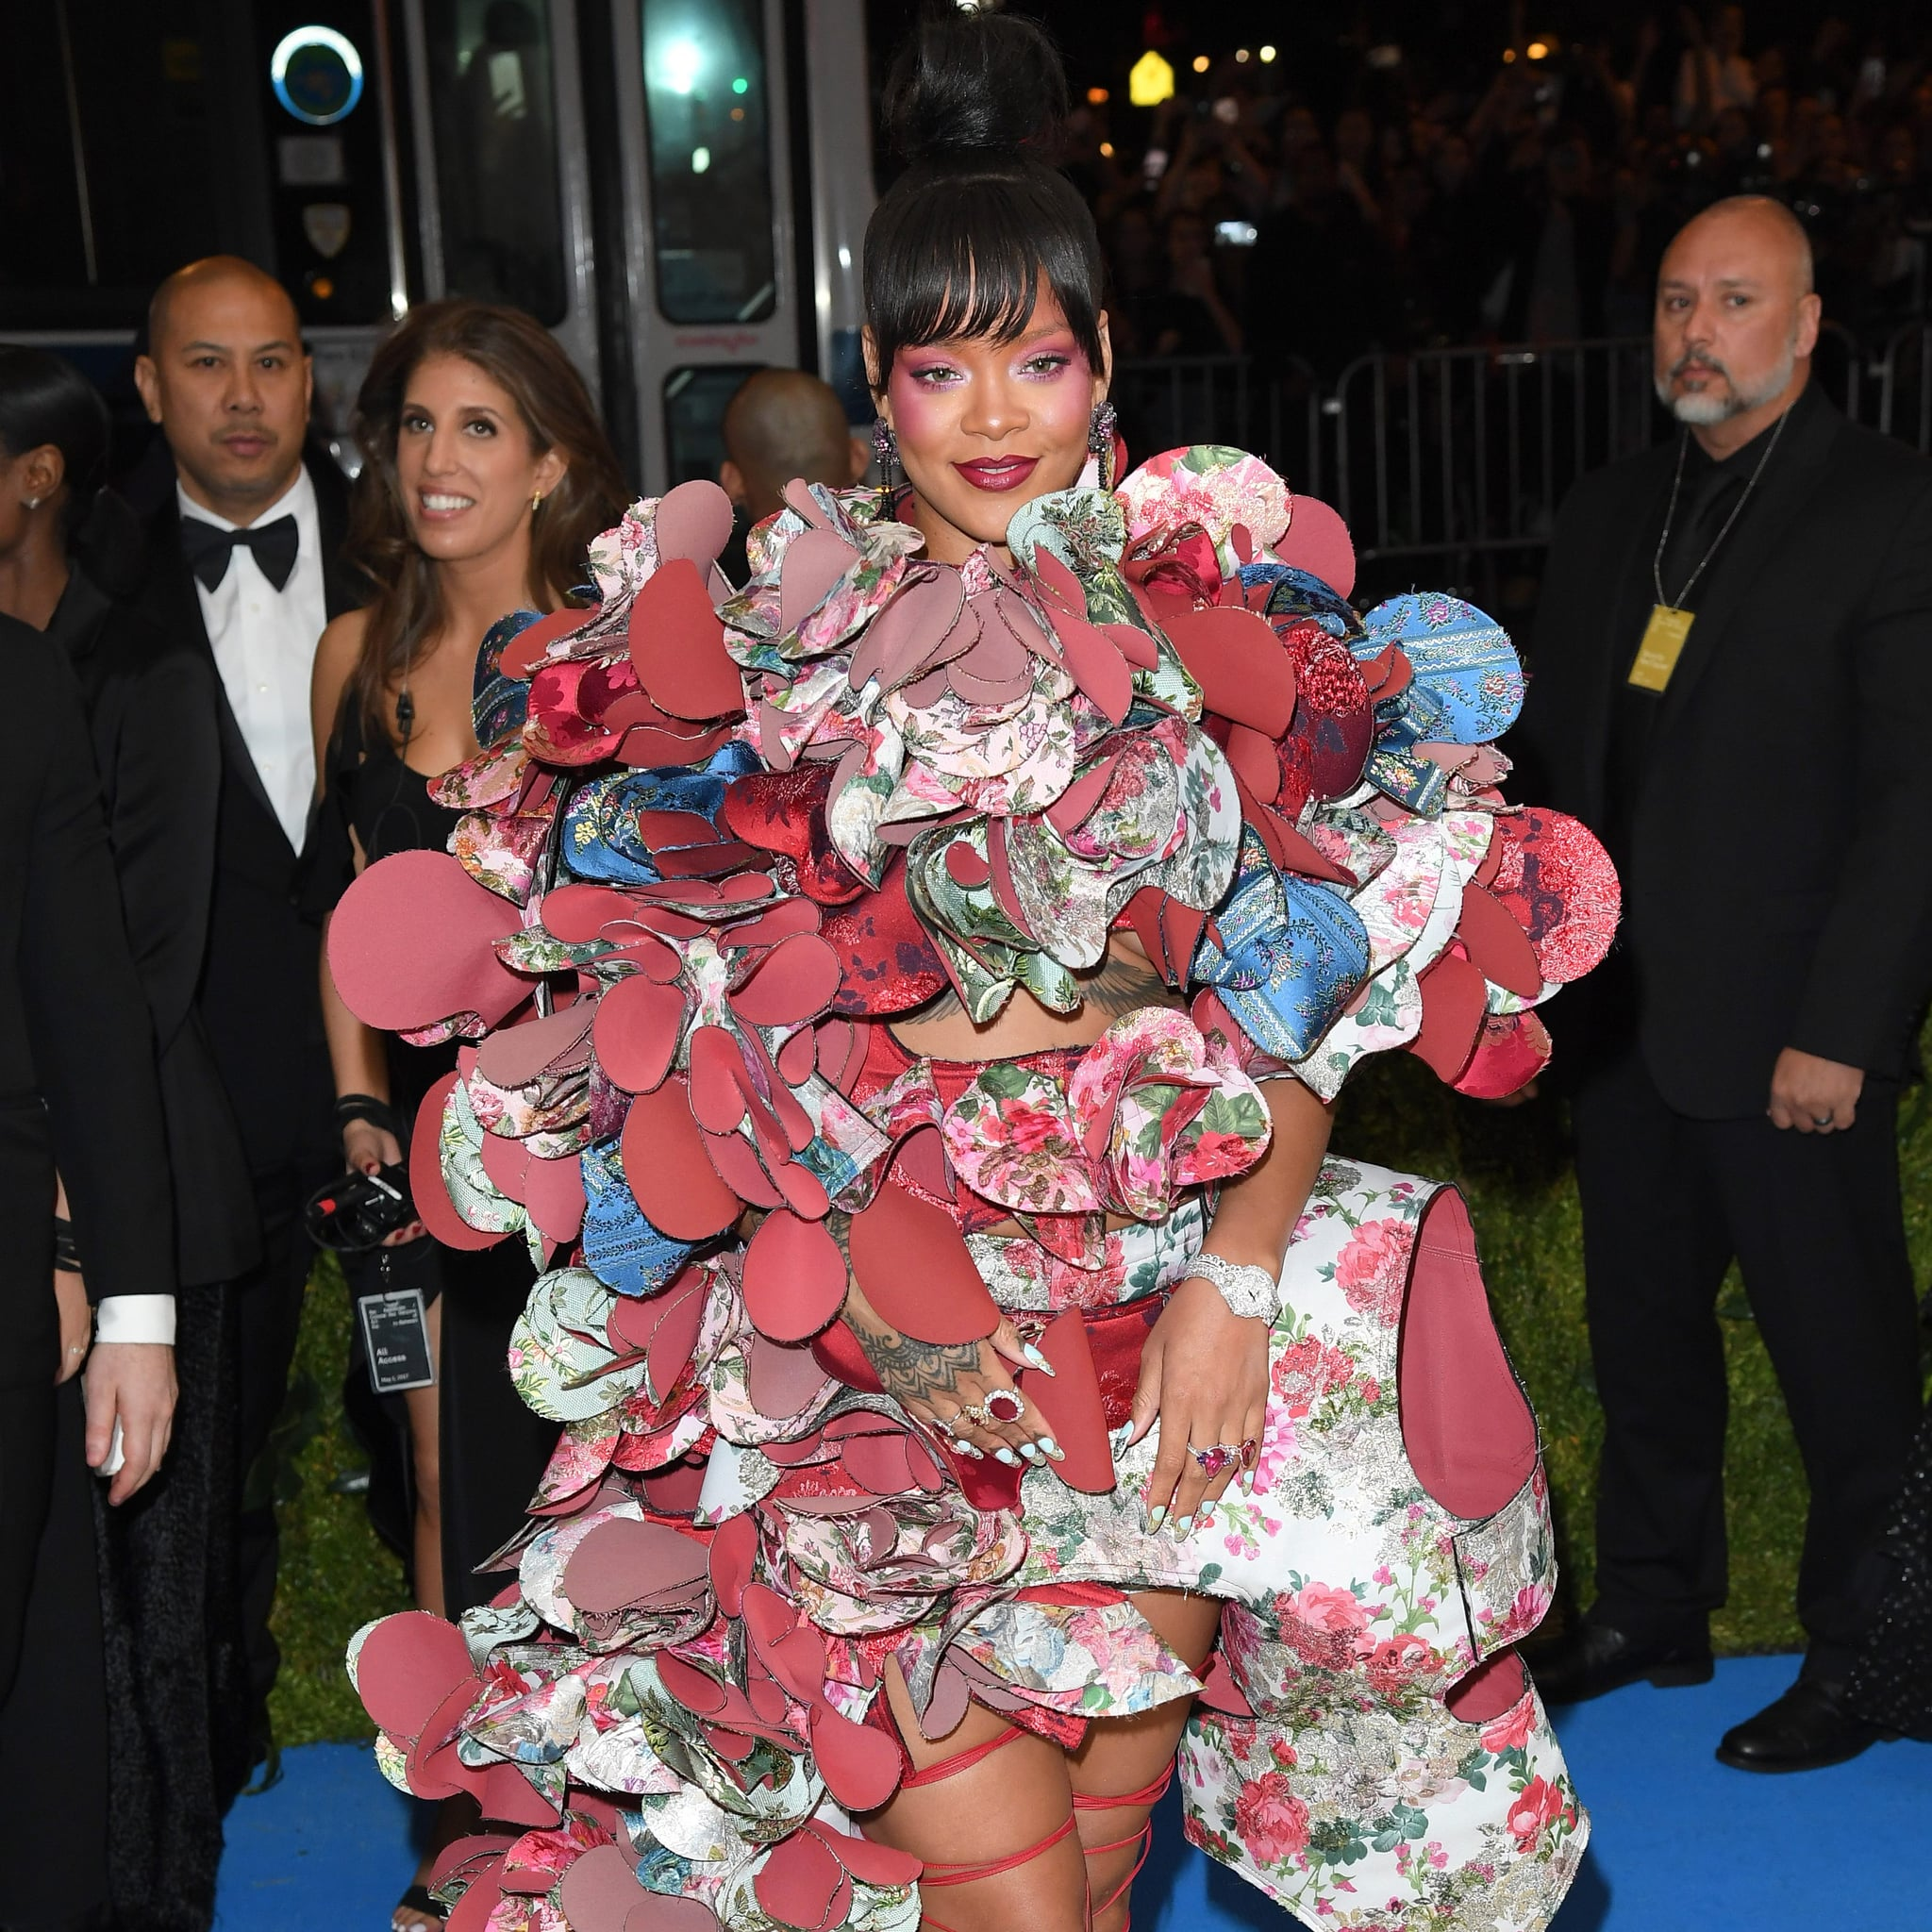 sc 1 st  Popsugar & Rihanna Halloween Costume Ideas | POPSUGAR Celebrity